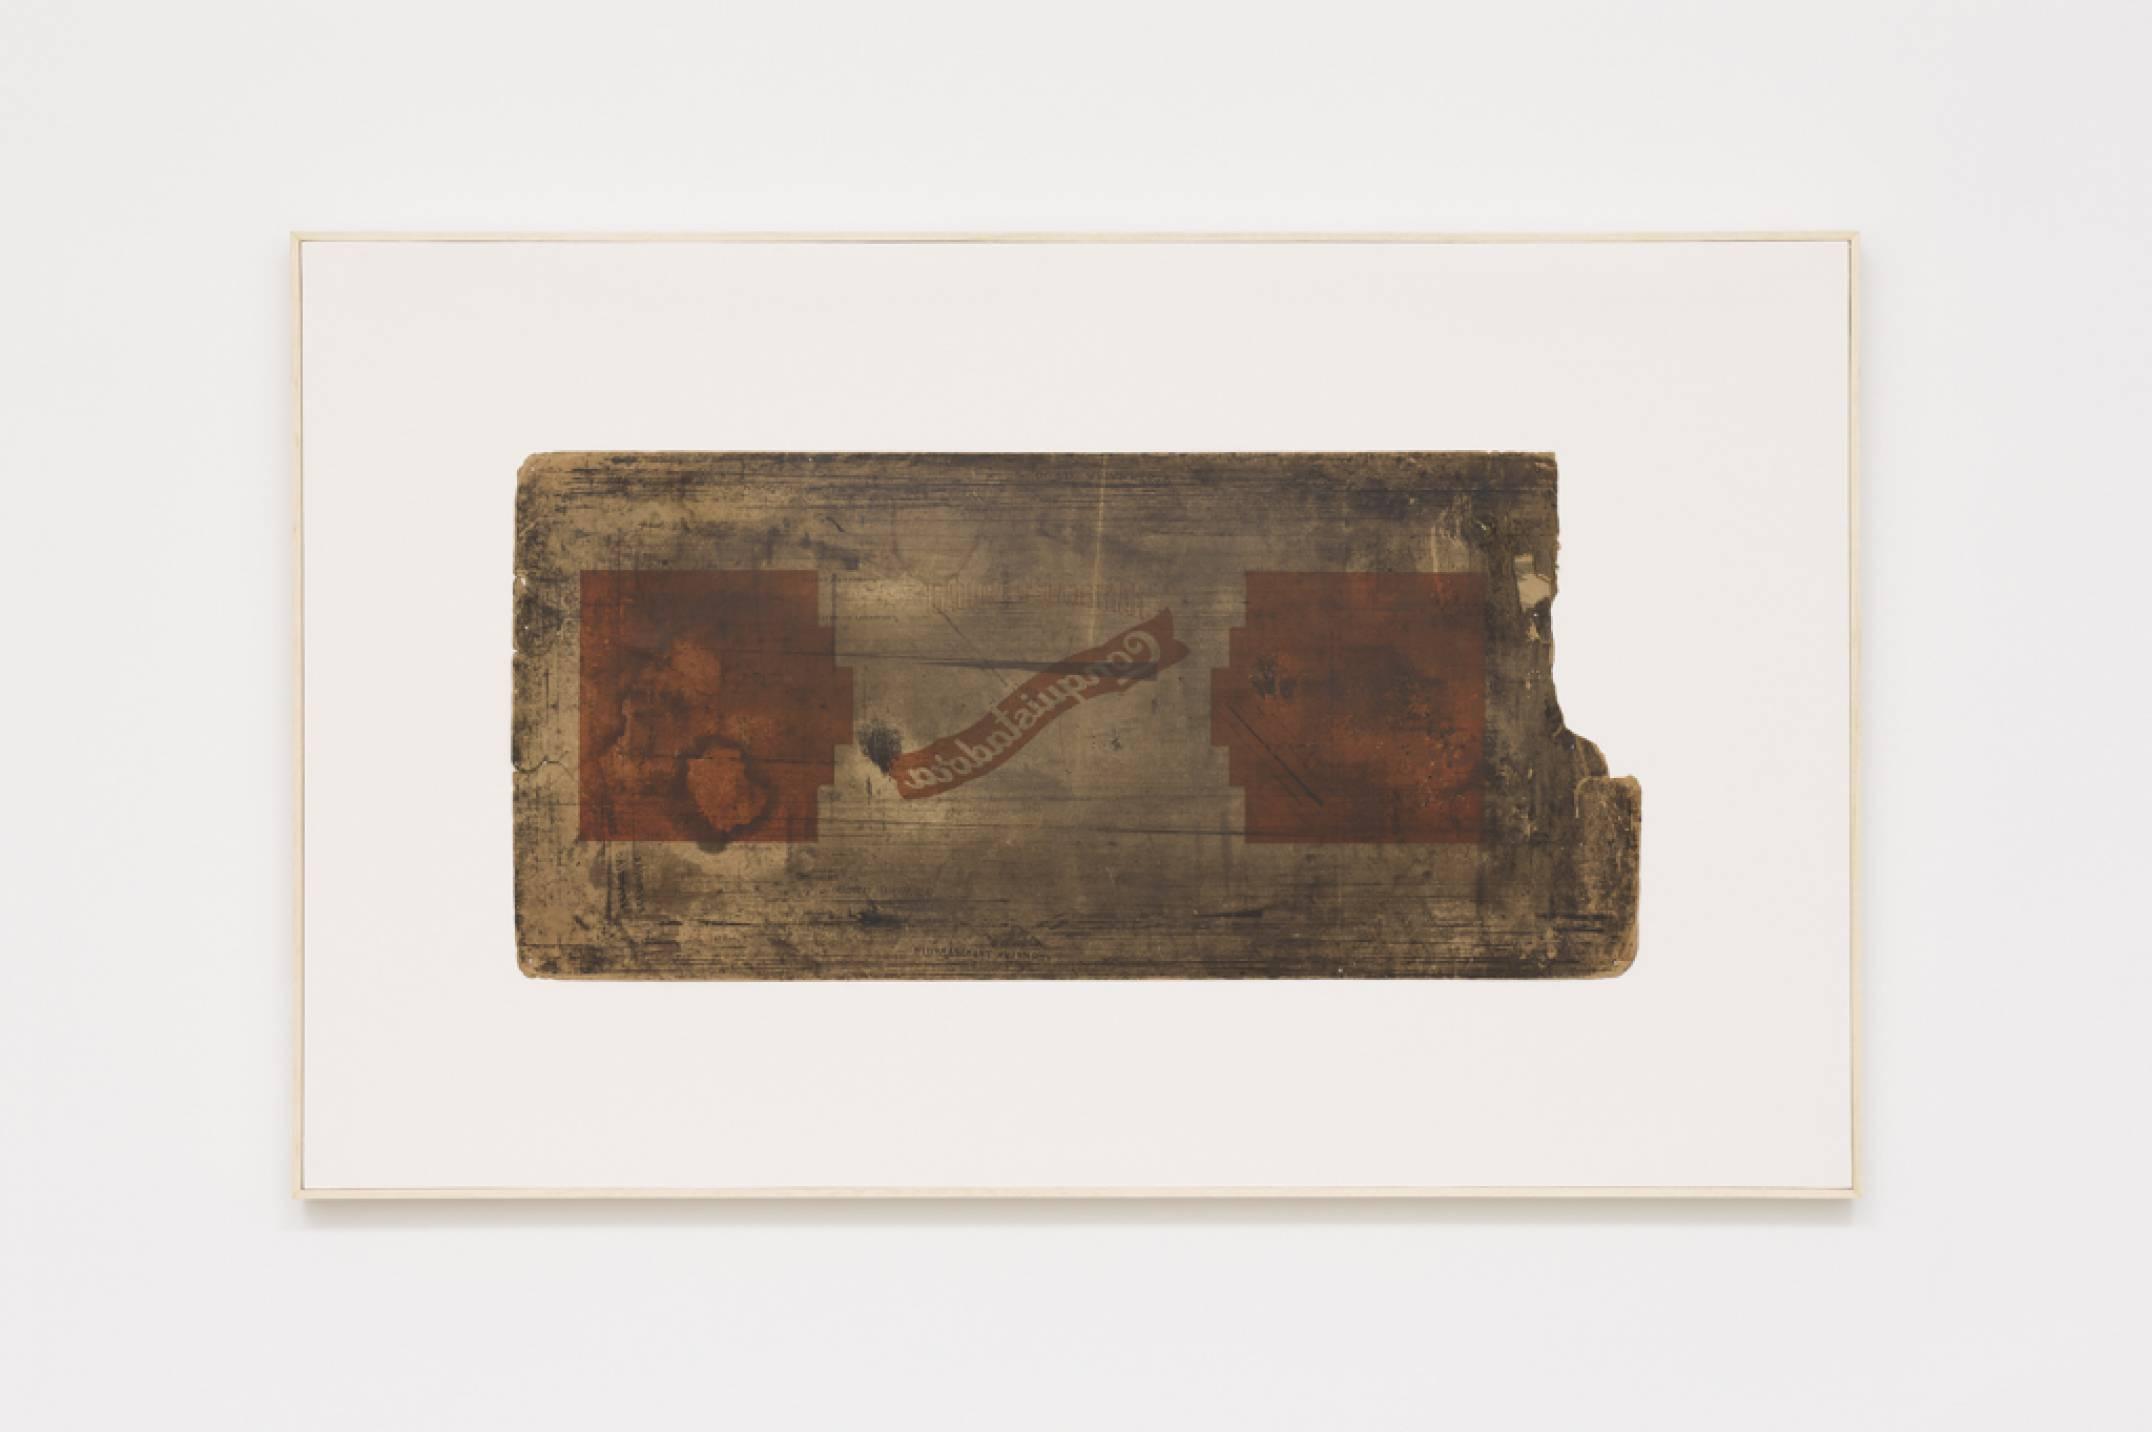 Lotus Lobo, <em>Conquistadora</em>,2016,lithograph on paper card, 70,5 × 115 cm - Mendes Wood DM